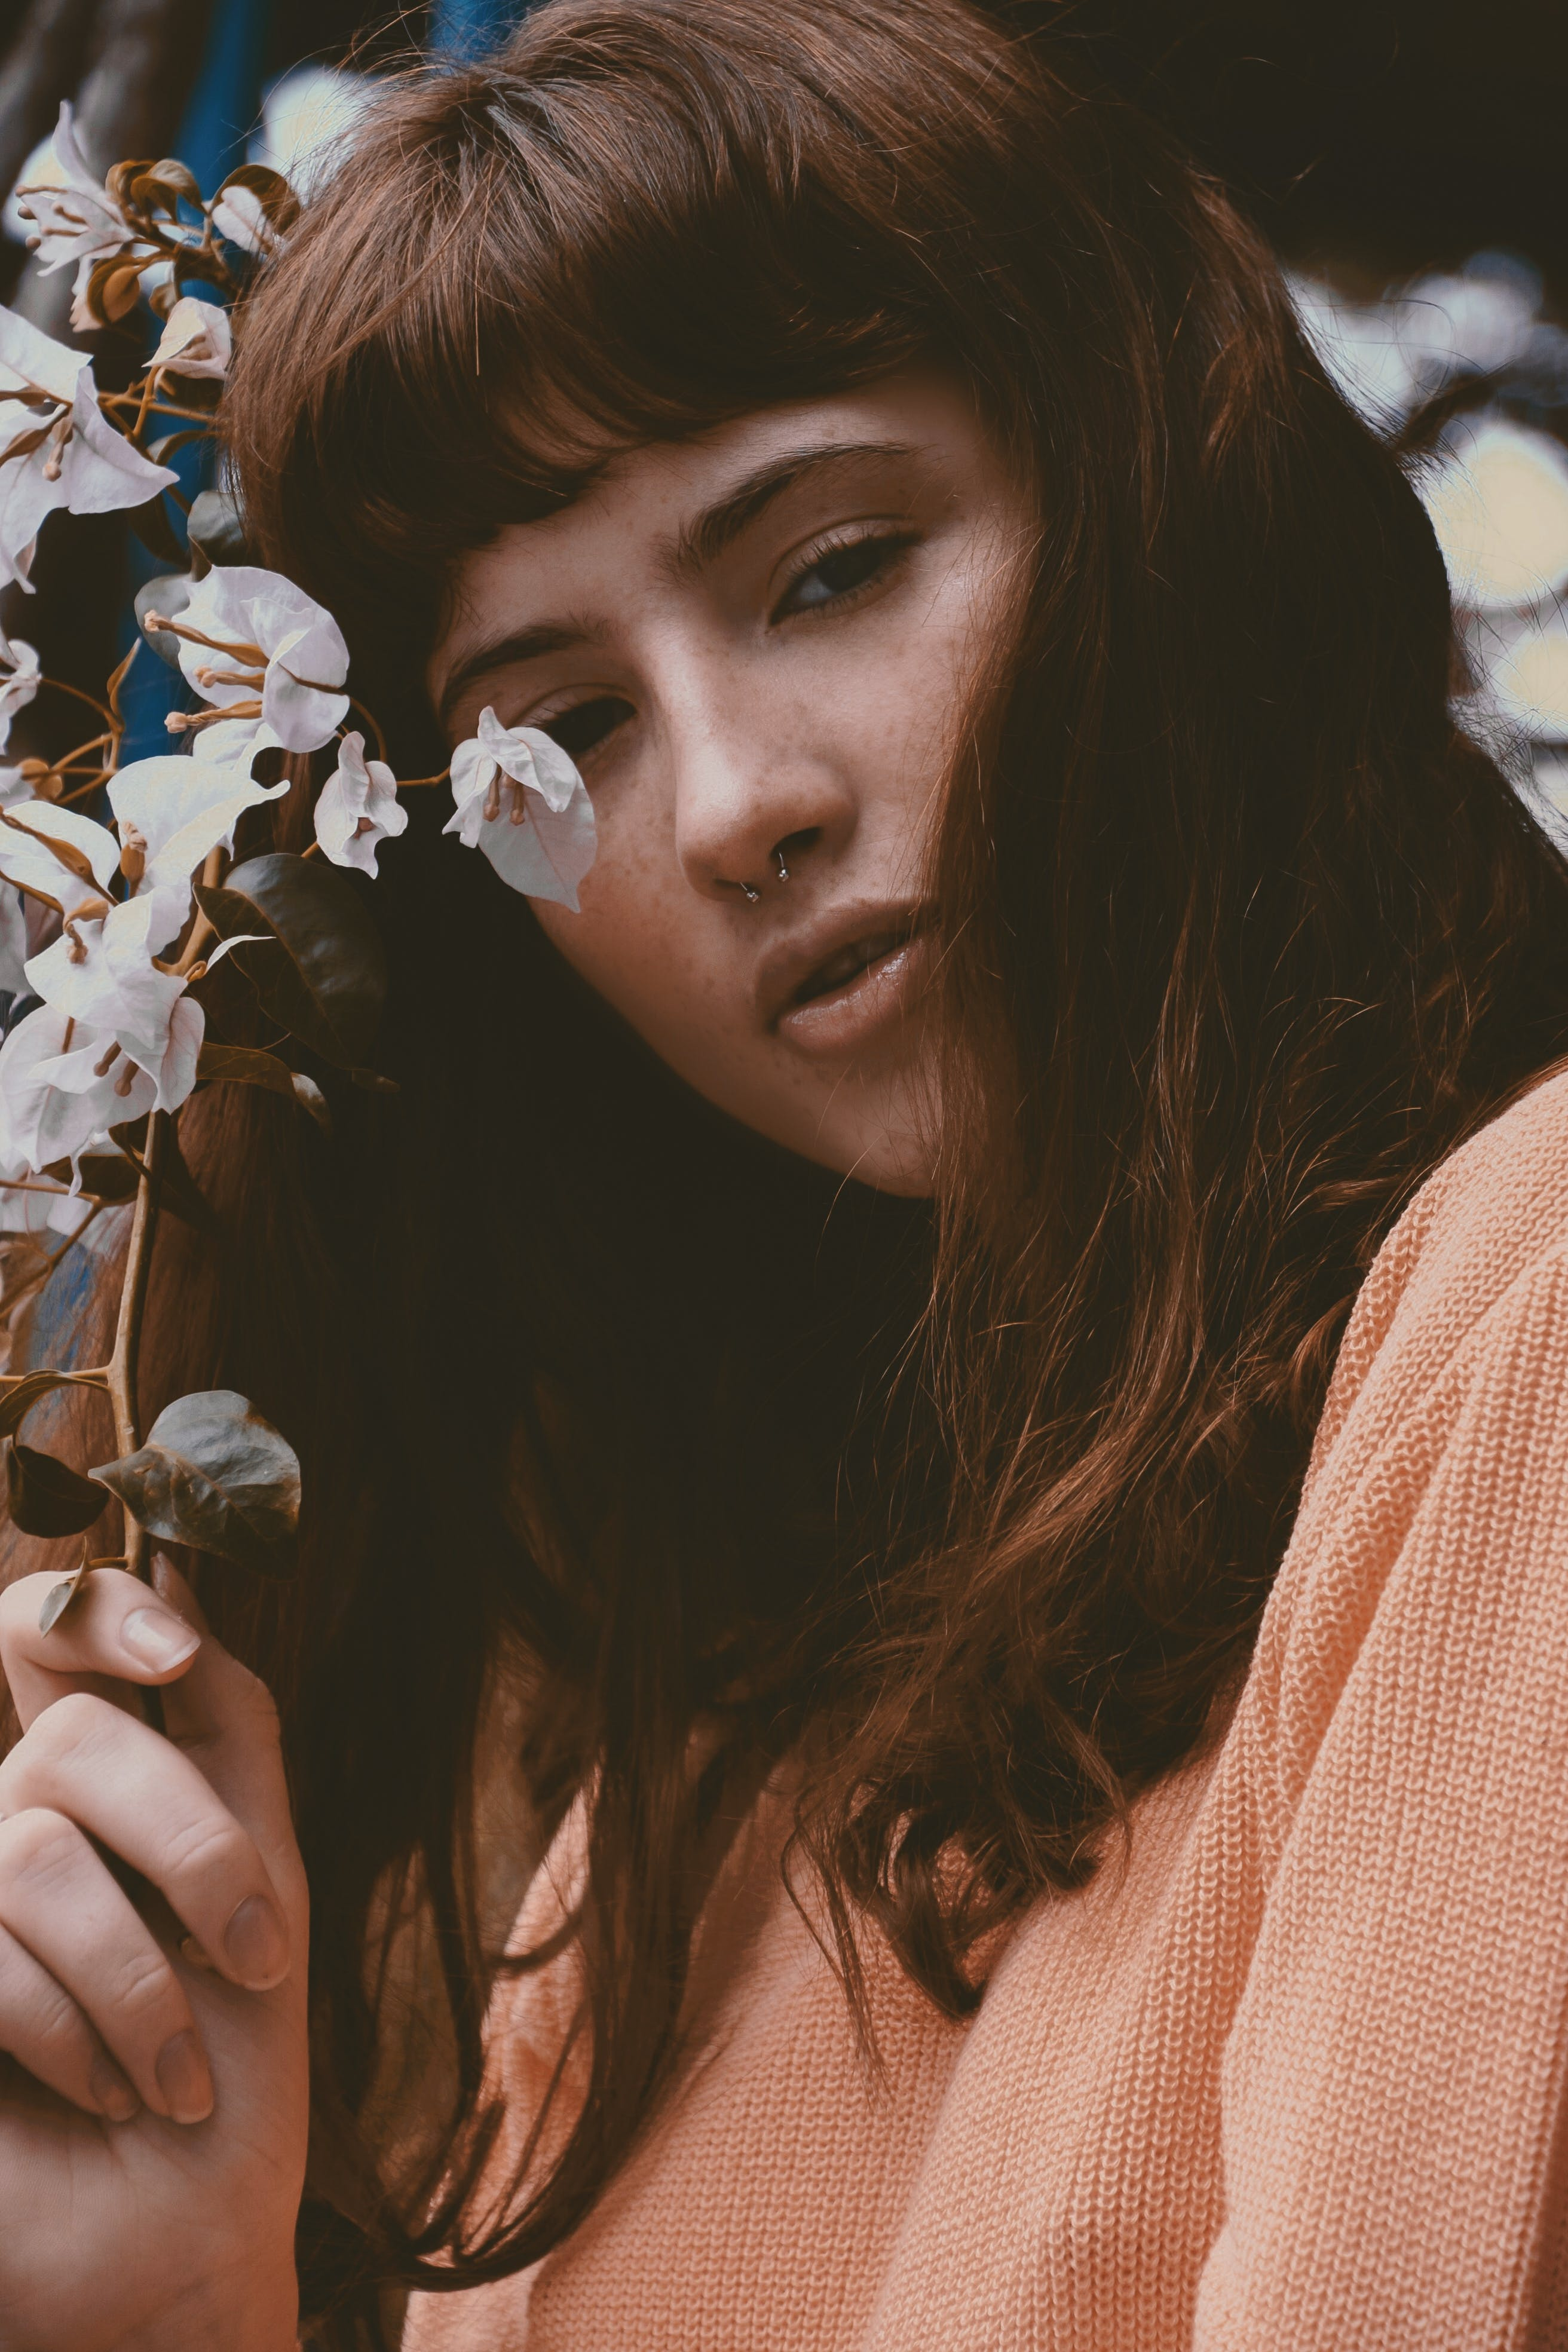 Woman Wearing Orange Sweat Shirt Holding White Flowers